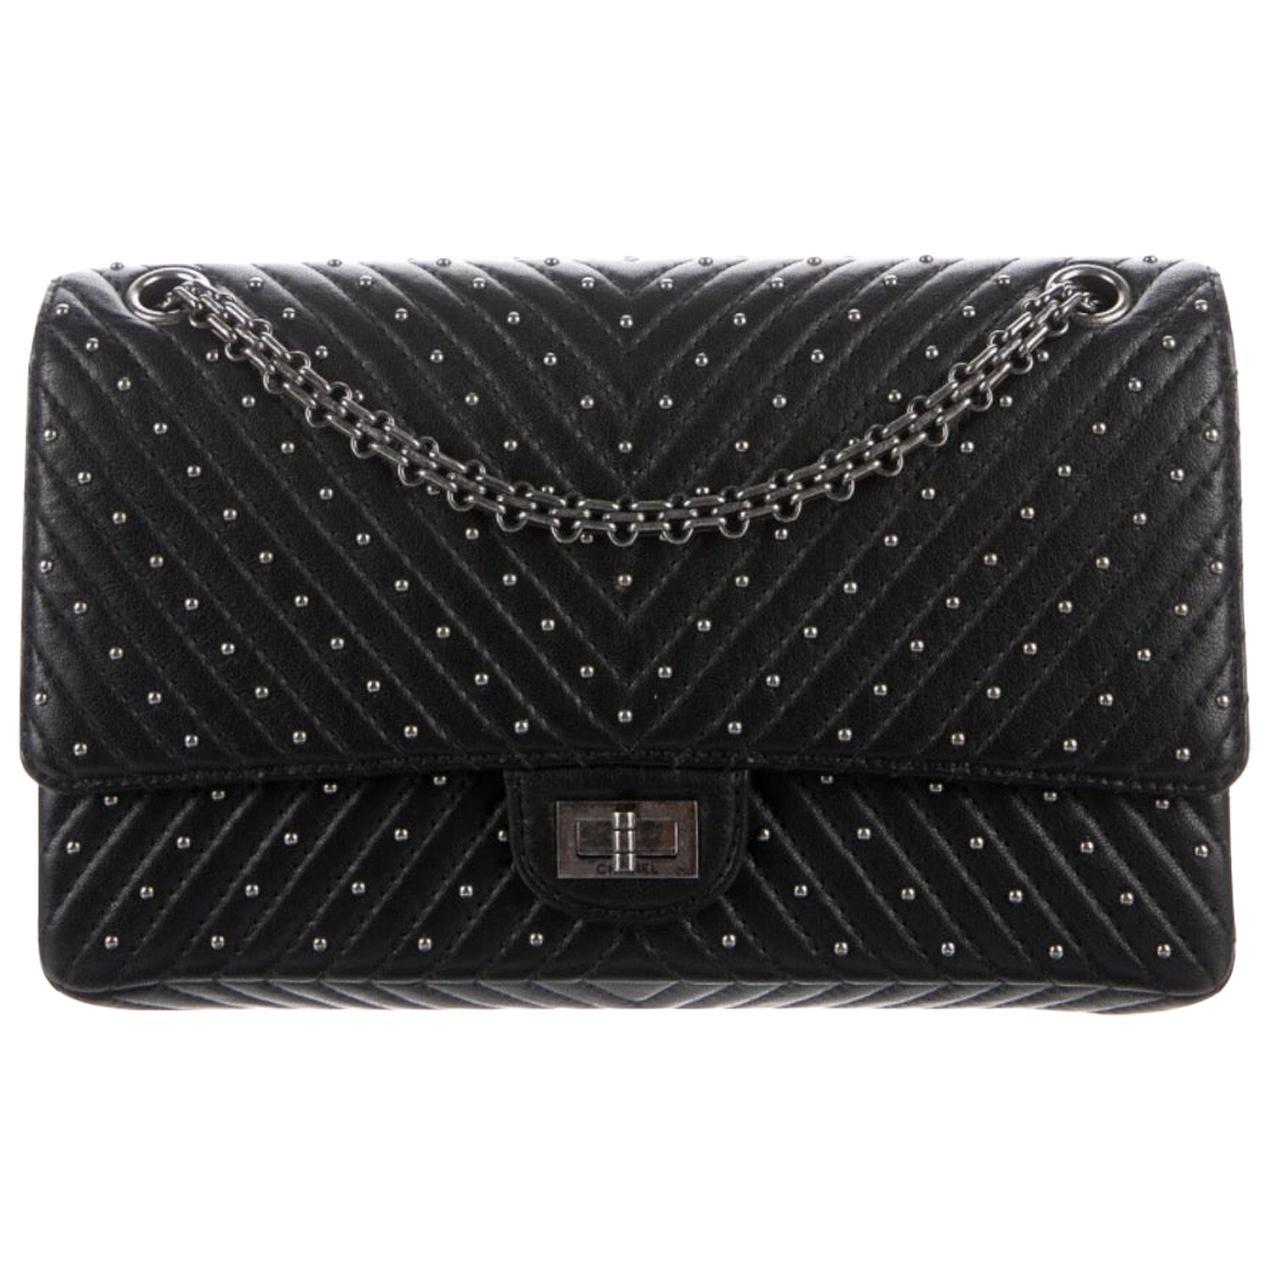 Chanel Black Leather Silver Stud Medium Evening Shoulder Double Flap Bag